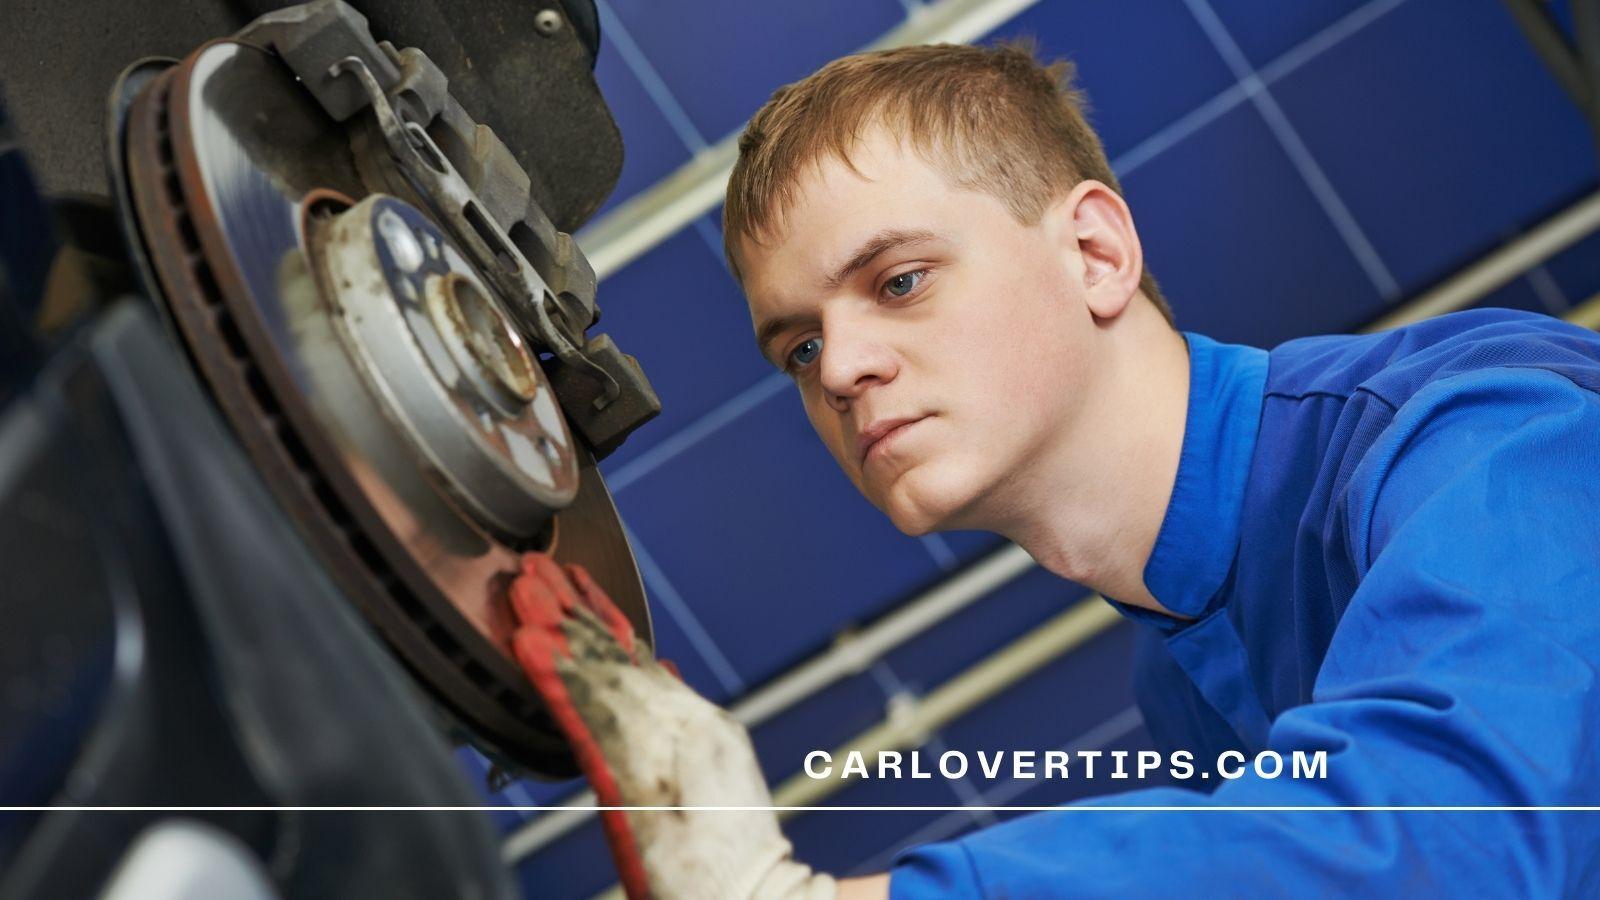 Perform Brake Inspection - Car Lover Tips